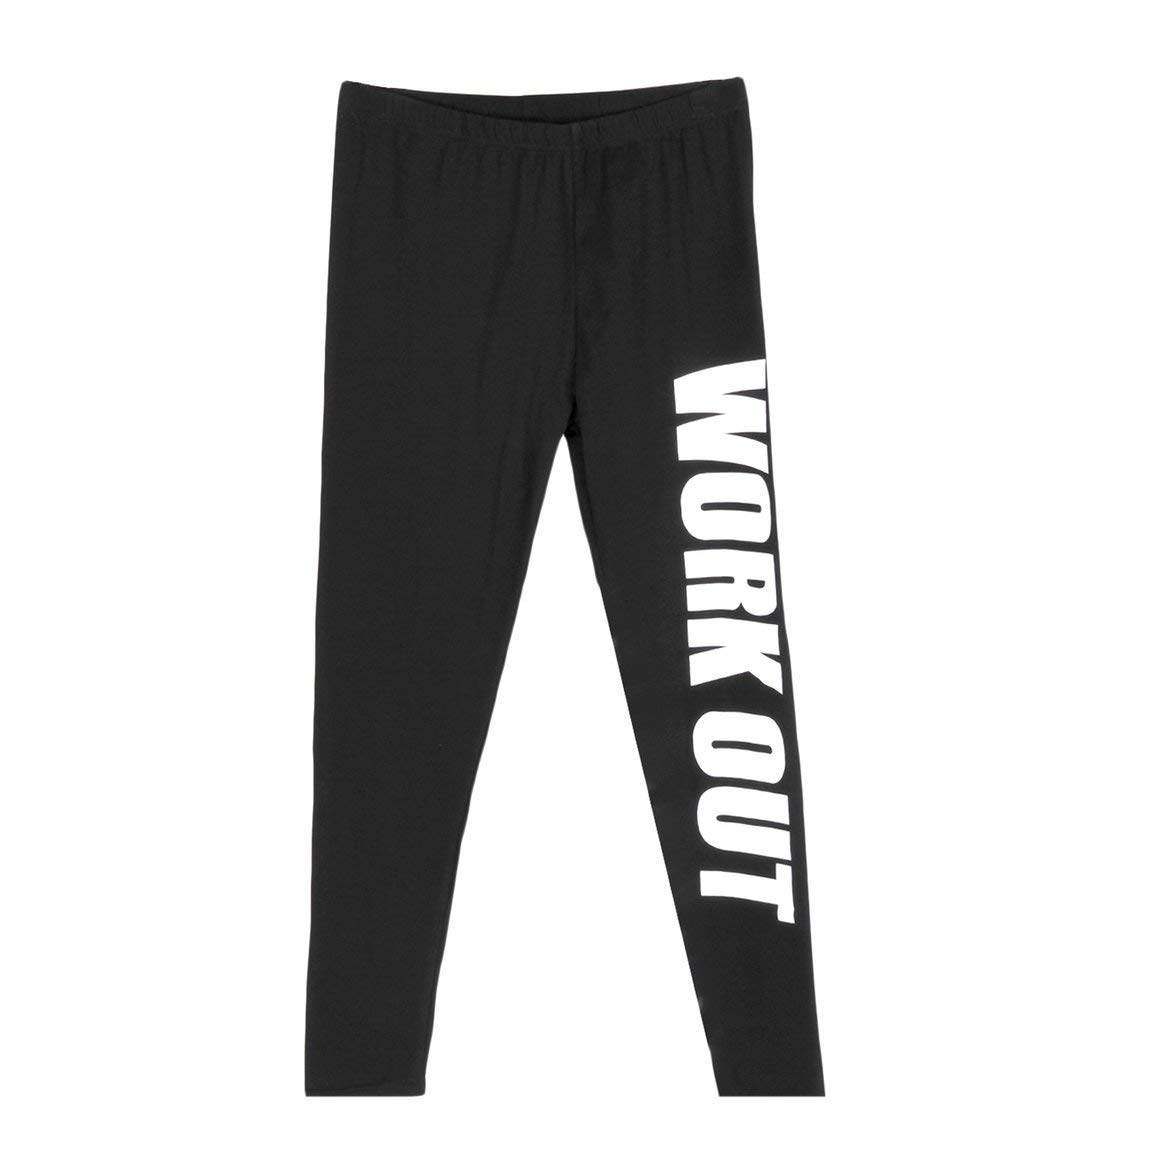 Delicacydex Leggings da allenamento per donna Elastic Comodo Stretch Sport Slim Legging Workout Pants Yo-ga Gym Fitness Fitness Pants